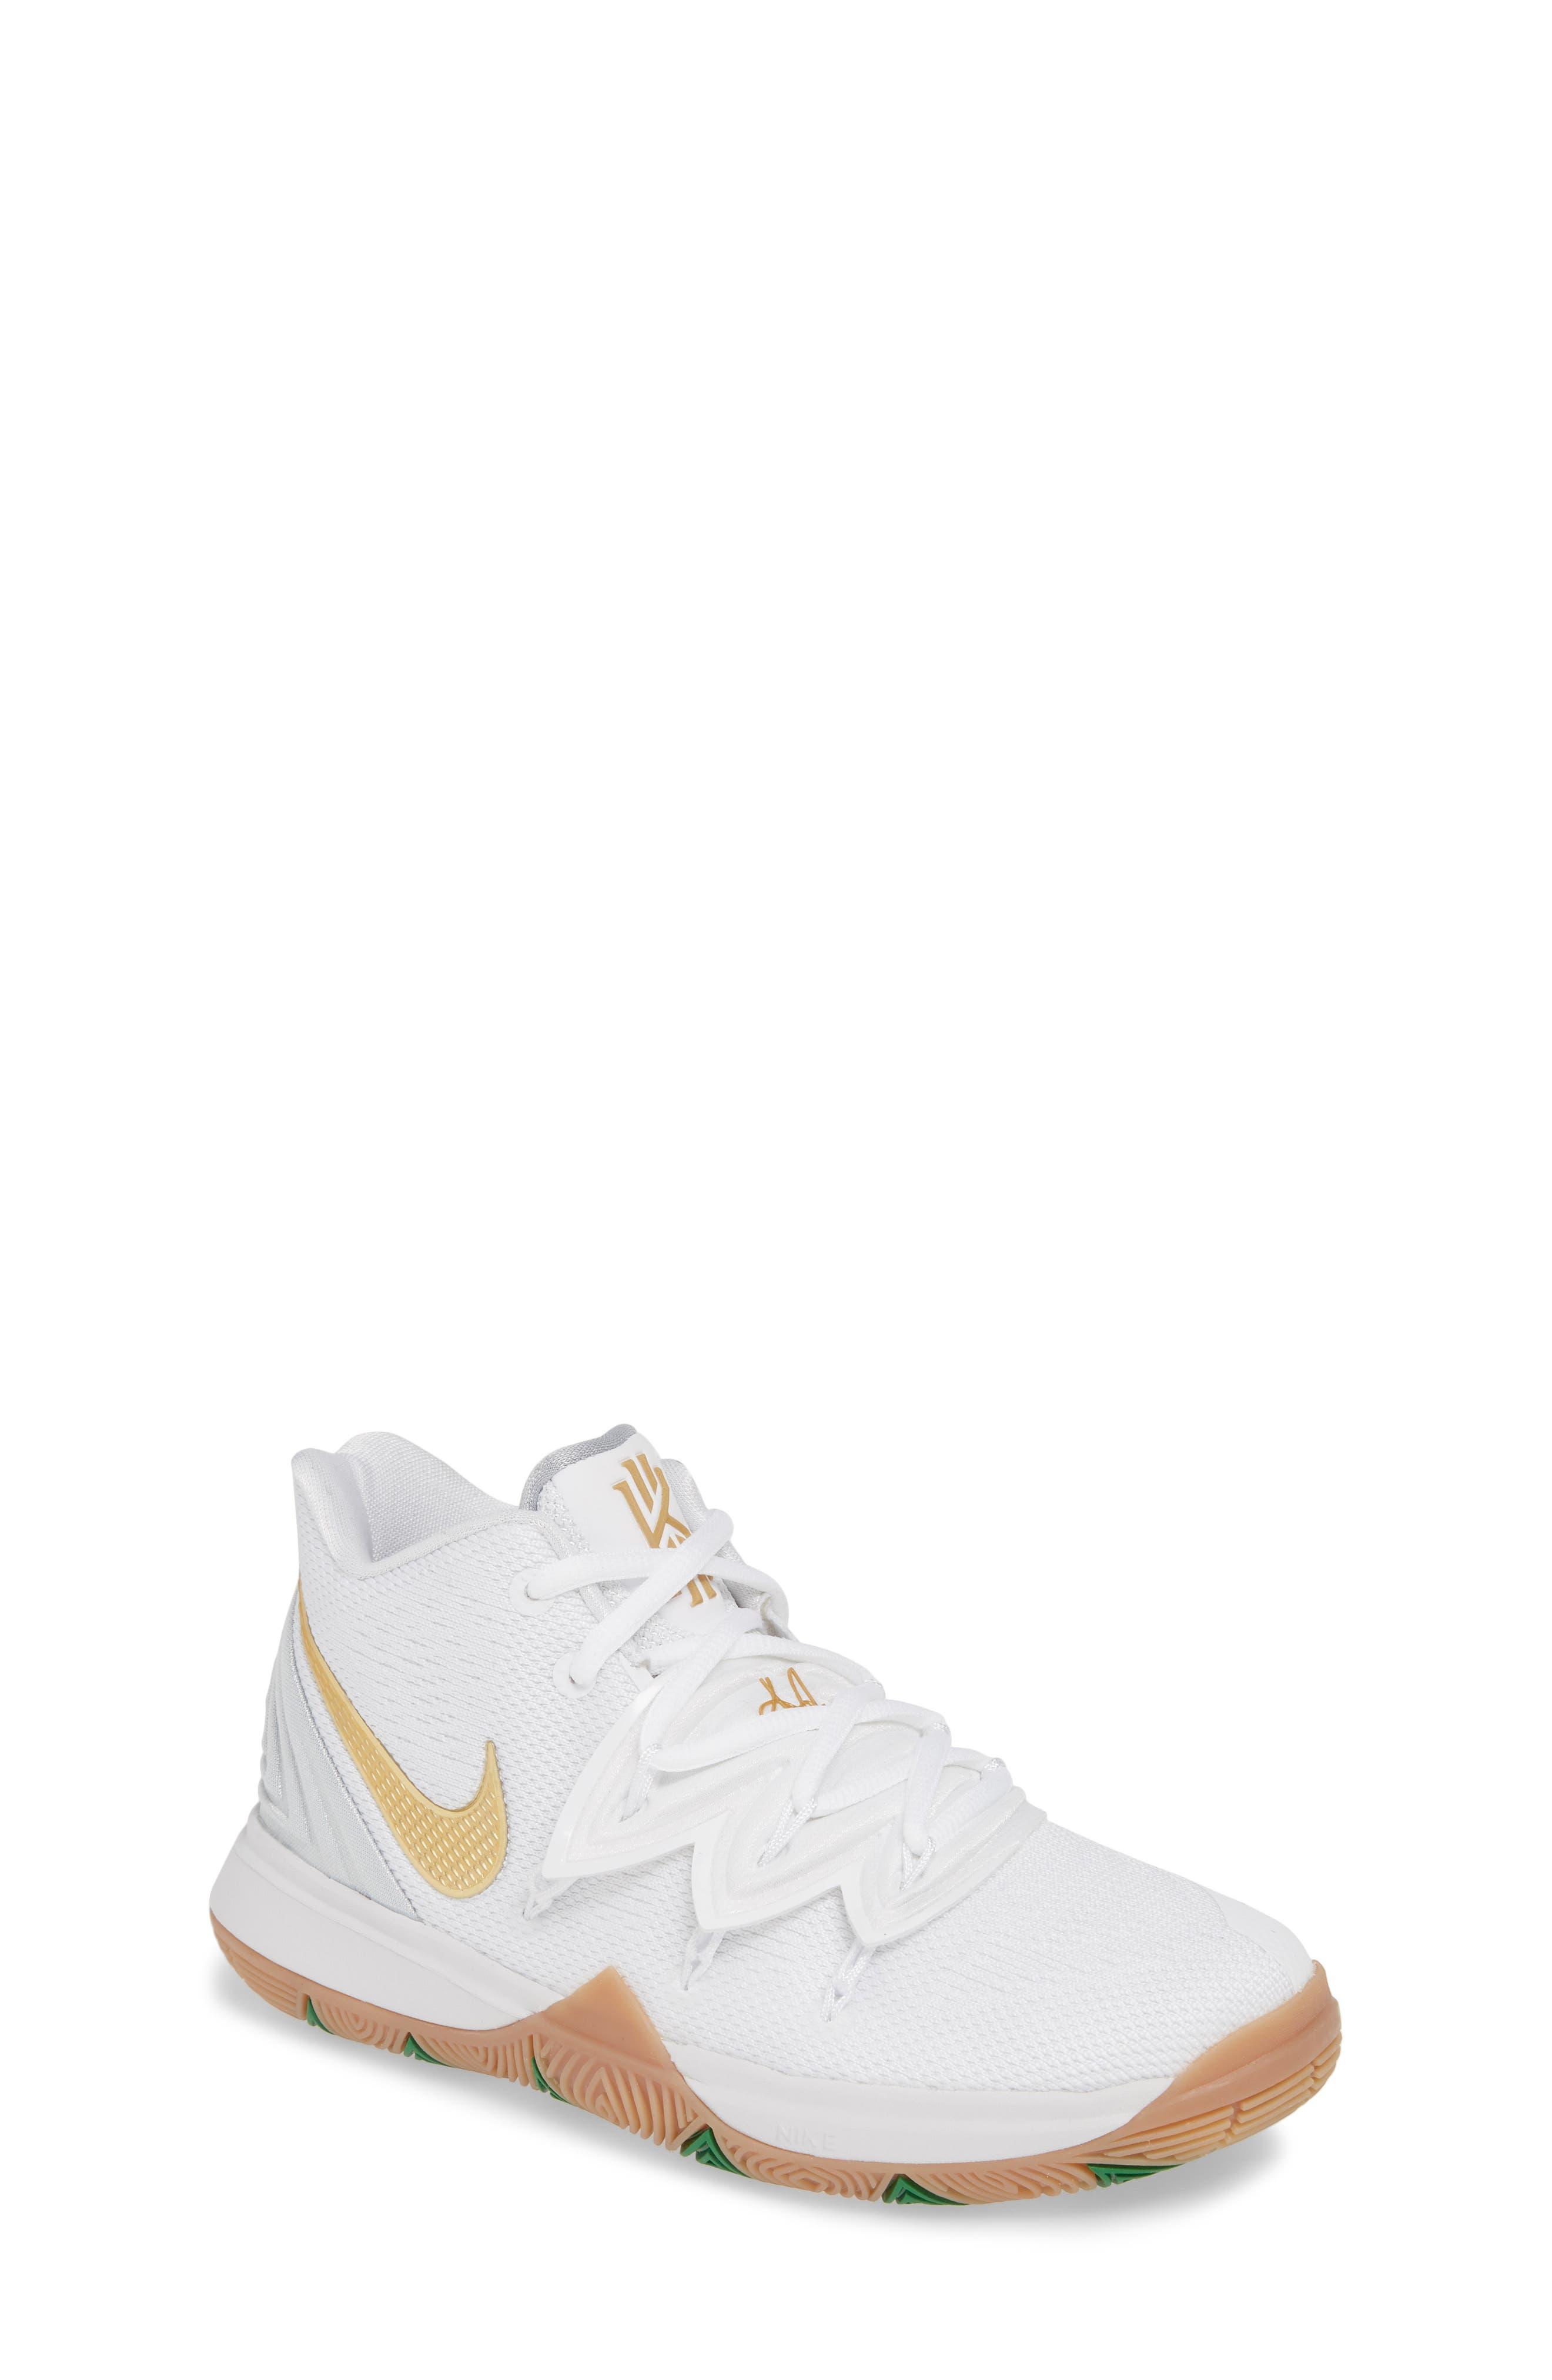 NIKE, Kyrie 5 Basketball Shoe, Main thumbnail 1, color, WHITE/ METALLIC GOLD-PLATINUM